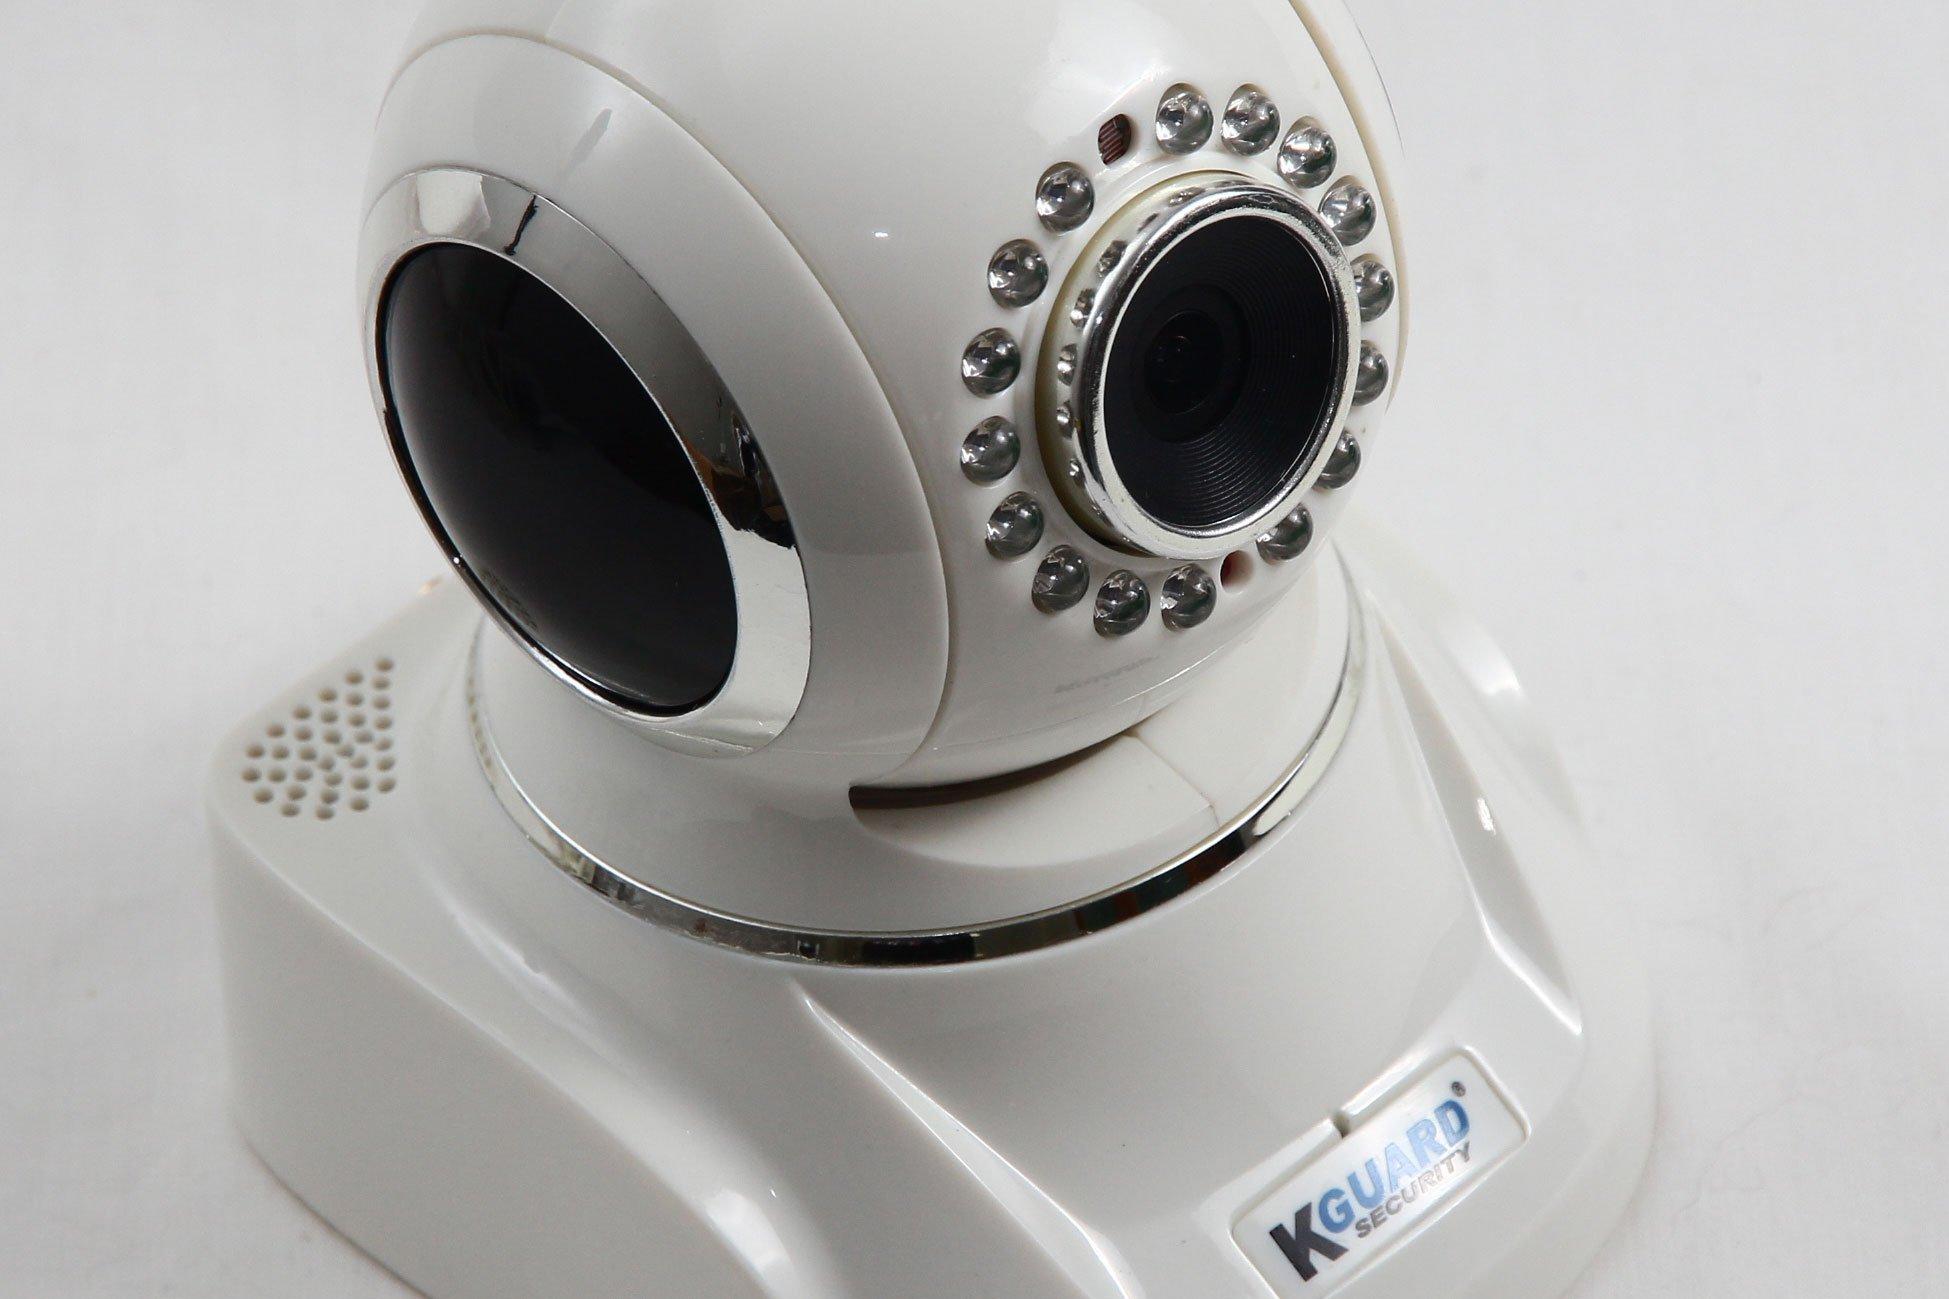 KGuard QRT-301 Wi-Fi Network Camera Review 2